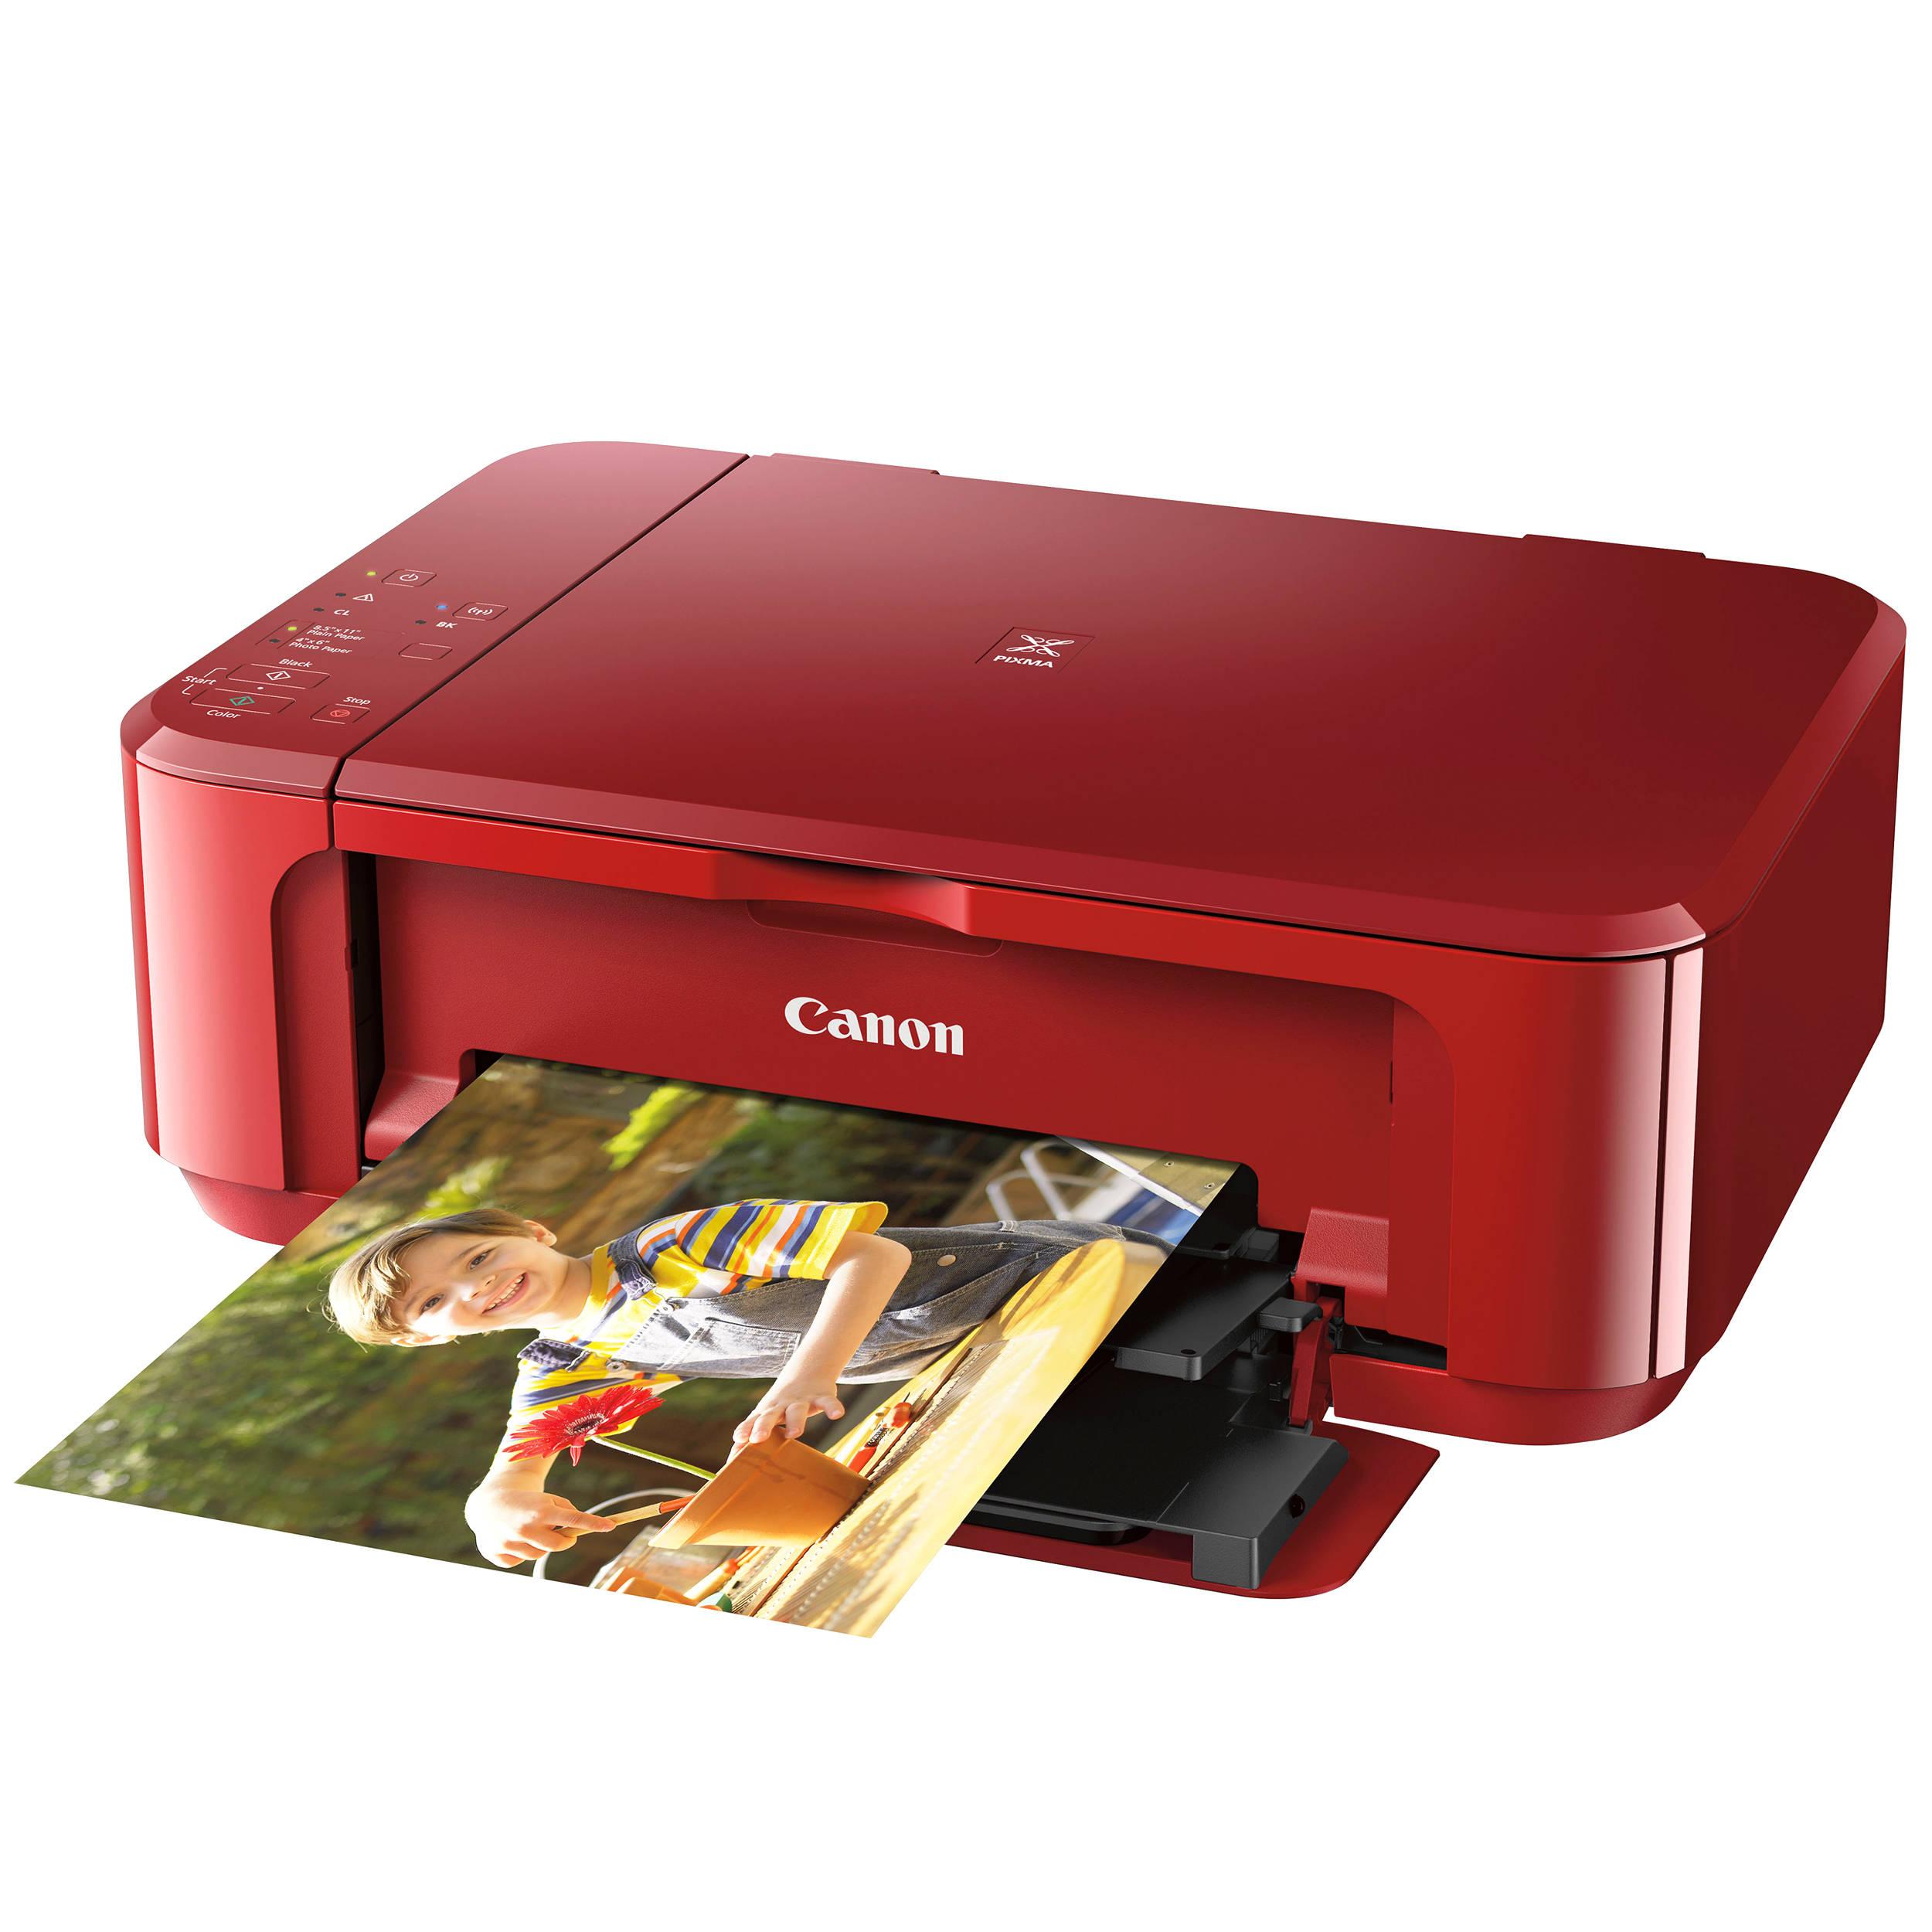 55d3fe3c03d2 Canon PIXMA MG3620 Wireless All-in-One Inkjet Printer 0515C042AA